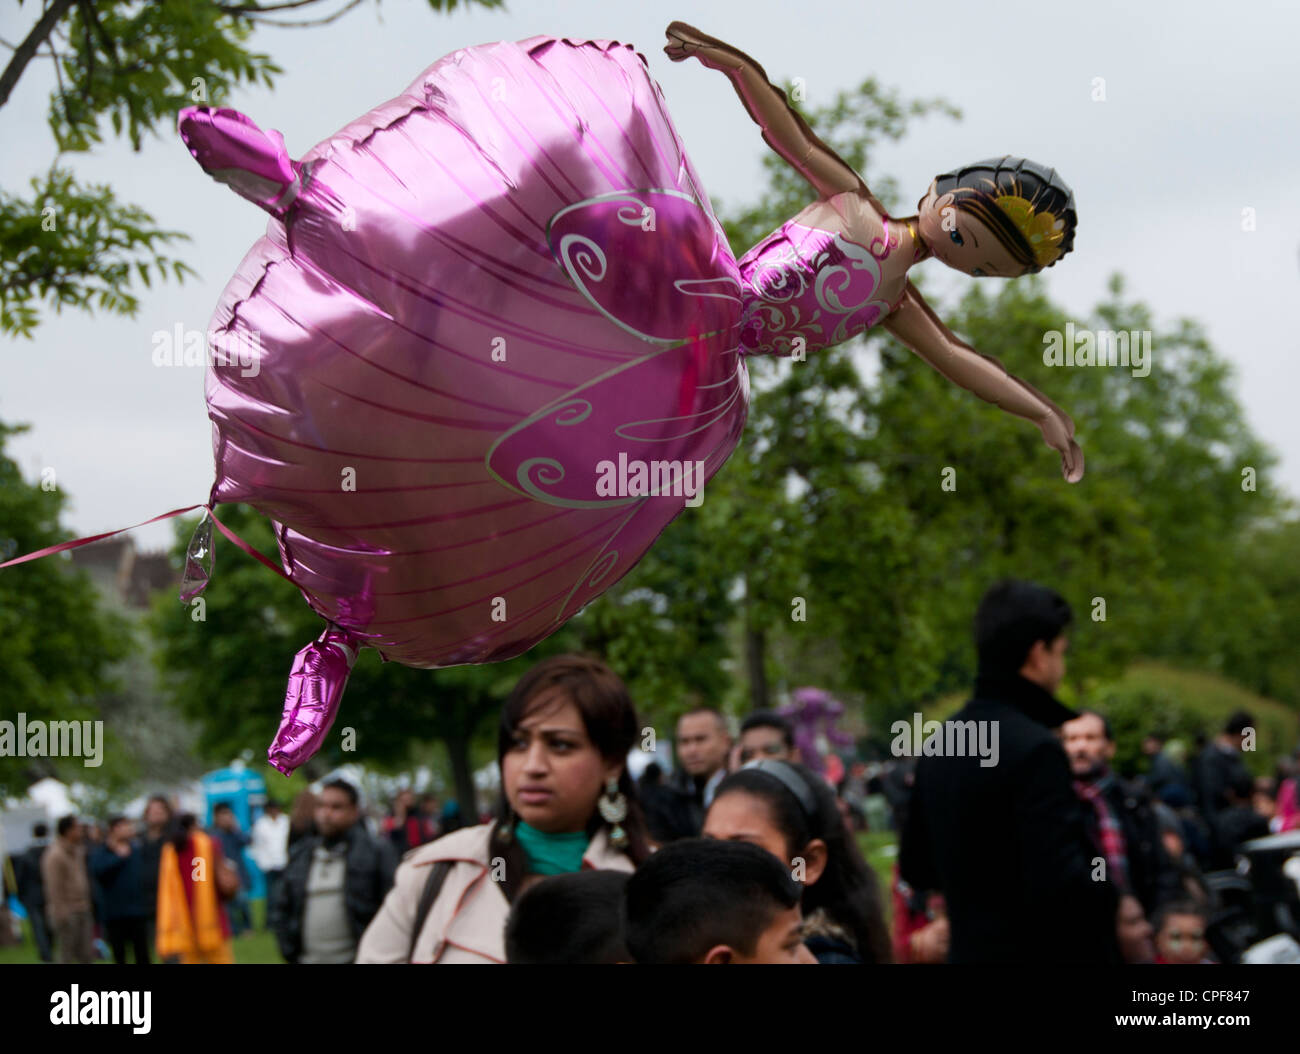 Boishakhi Mela, celebration for Bangladesh New Year. Pink ballet dancer balloon over crowd of local Bangladeshis - Stock Image